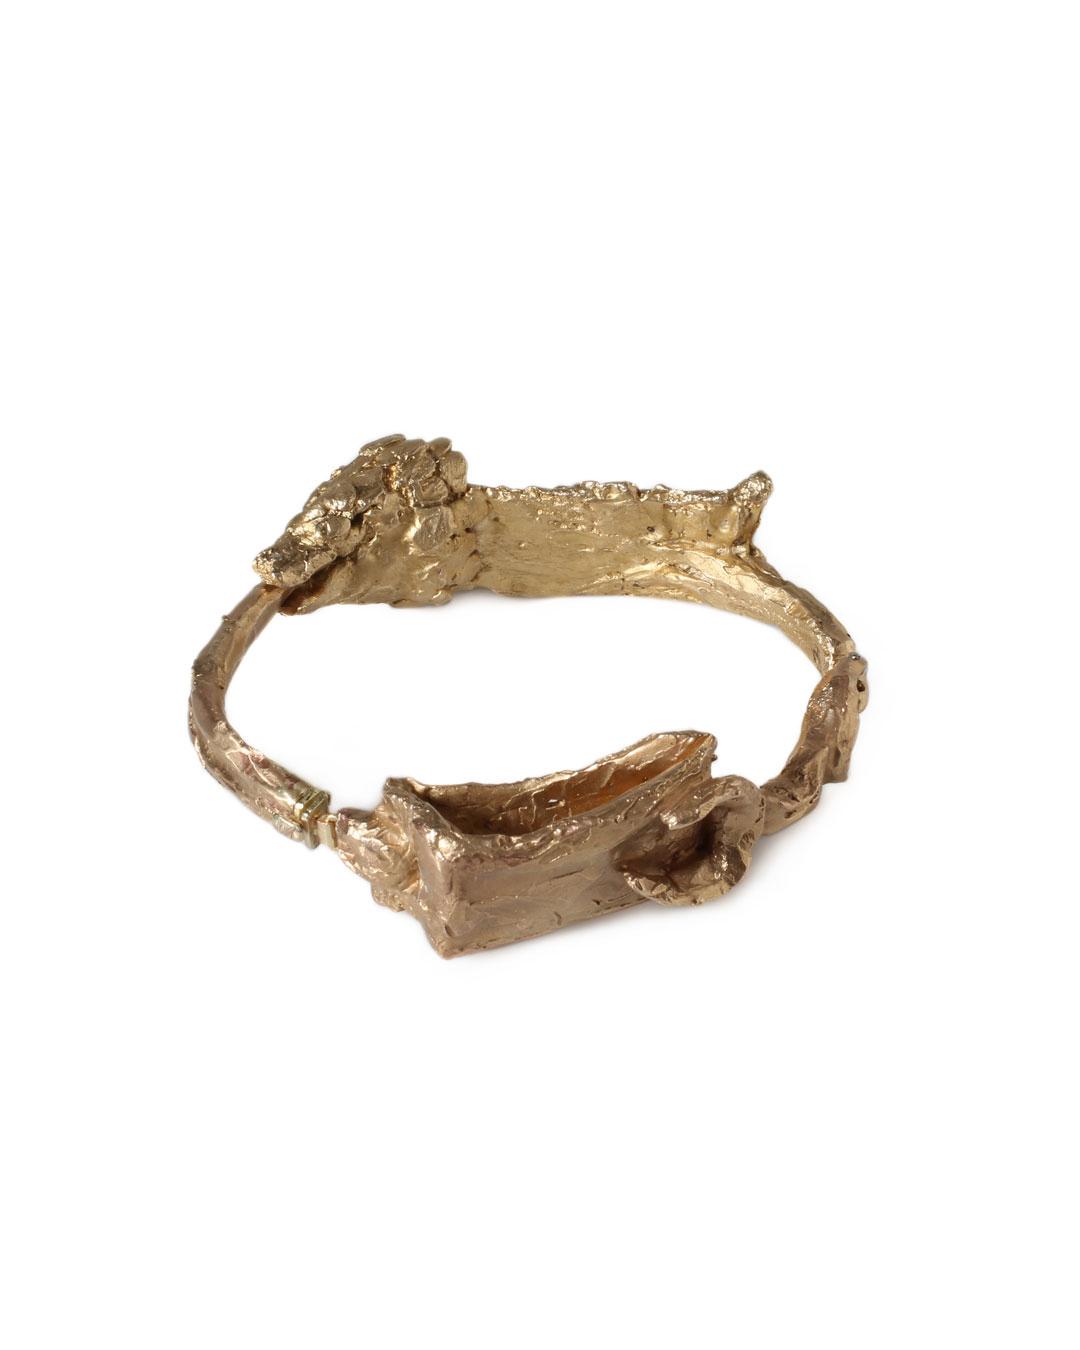 Juliane Brandes, zonder titel, 2013, armband; brons, 14 kt goud, 90 x 25 mm, €1950